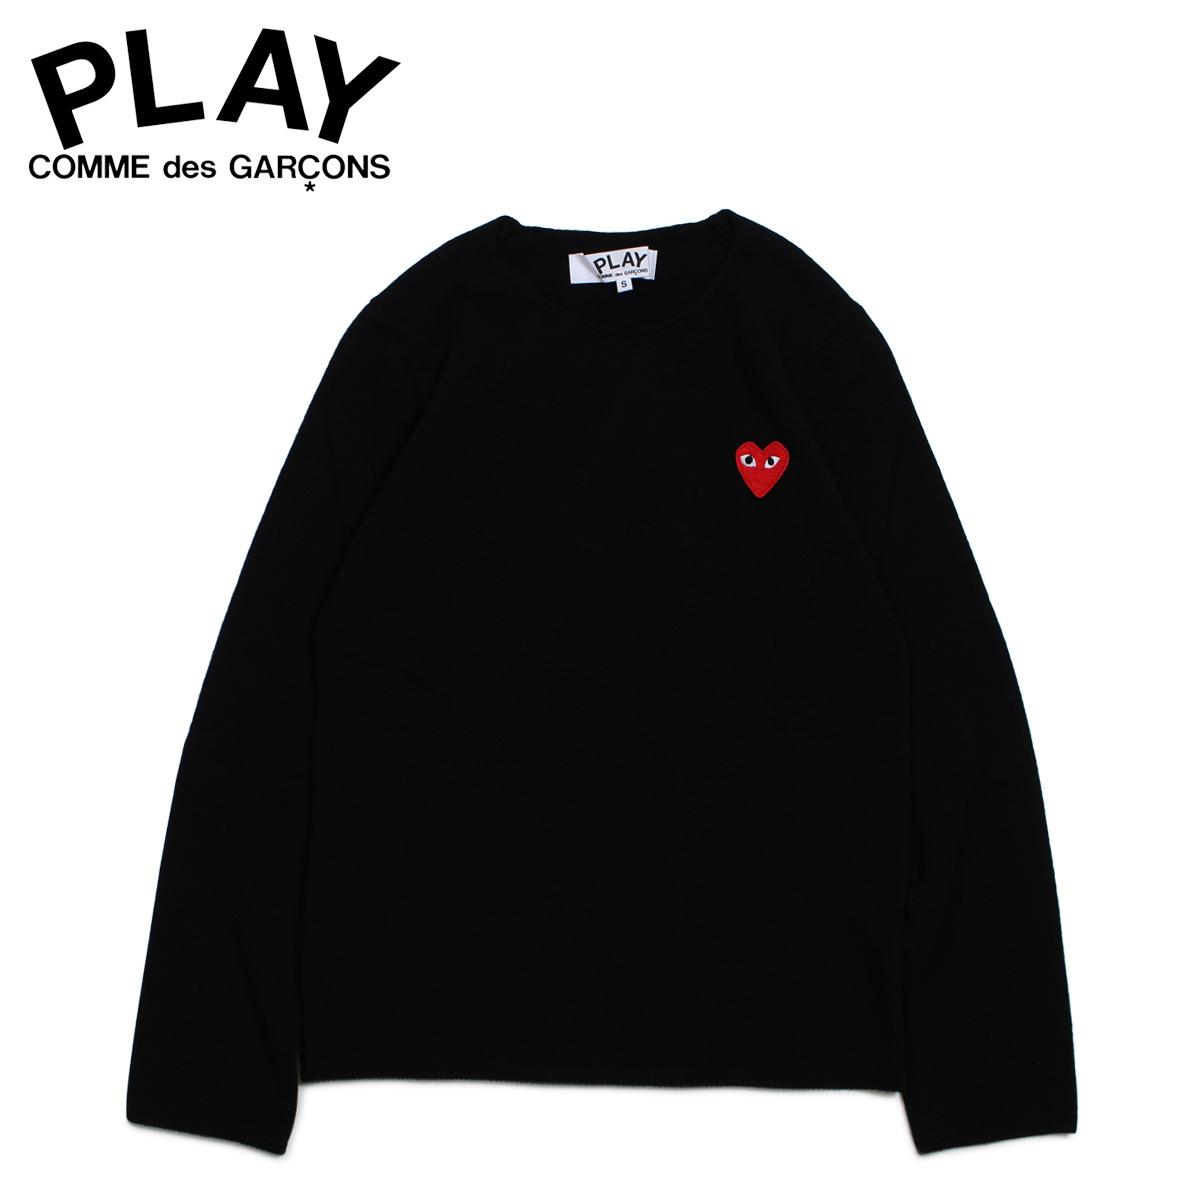 PLAY COMME des GARCONS コムデギャルソン ニット セーター レディース RED HEART CREW NECK SWEATER ブラック 黒 AZ-N067 [4/1 新入荷]